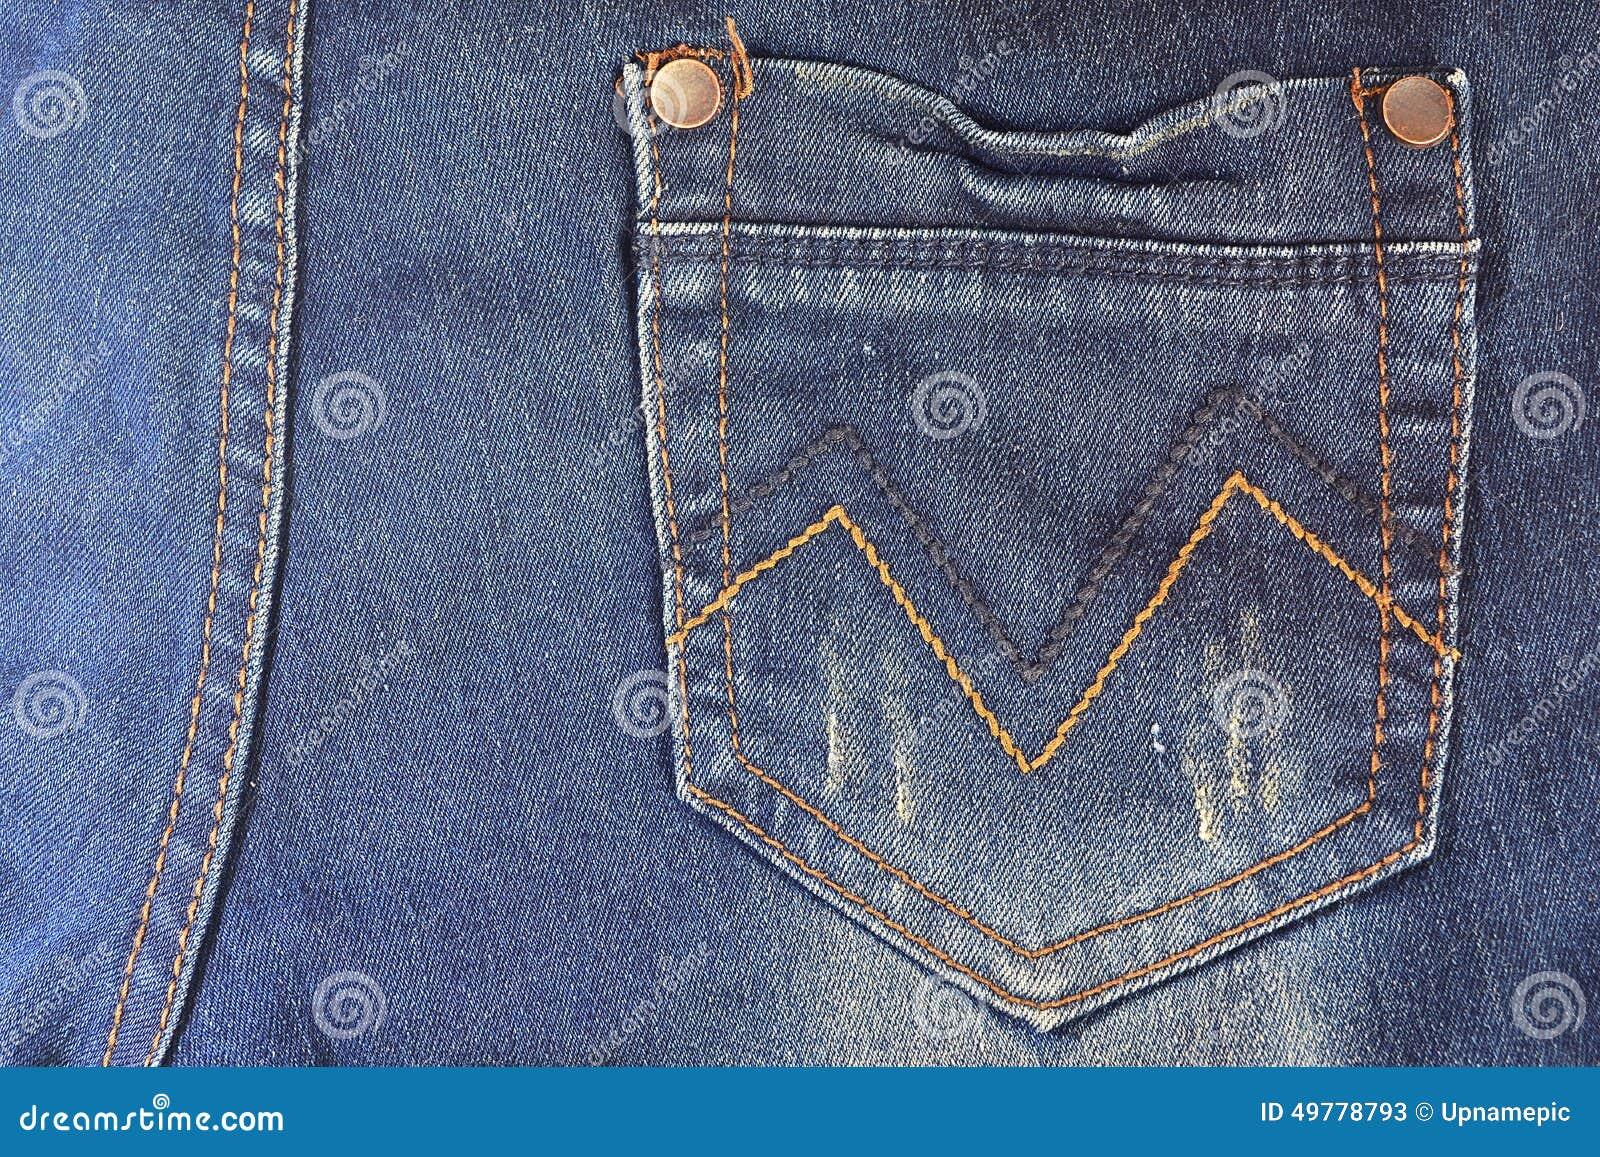 blue jeans pocket stock photo image 49778793